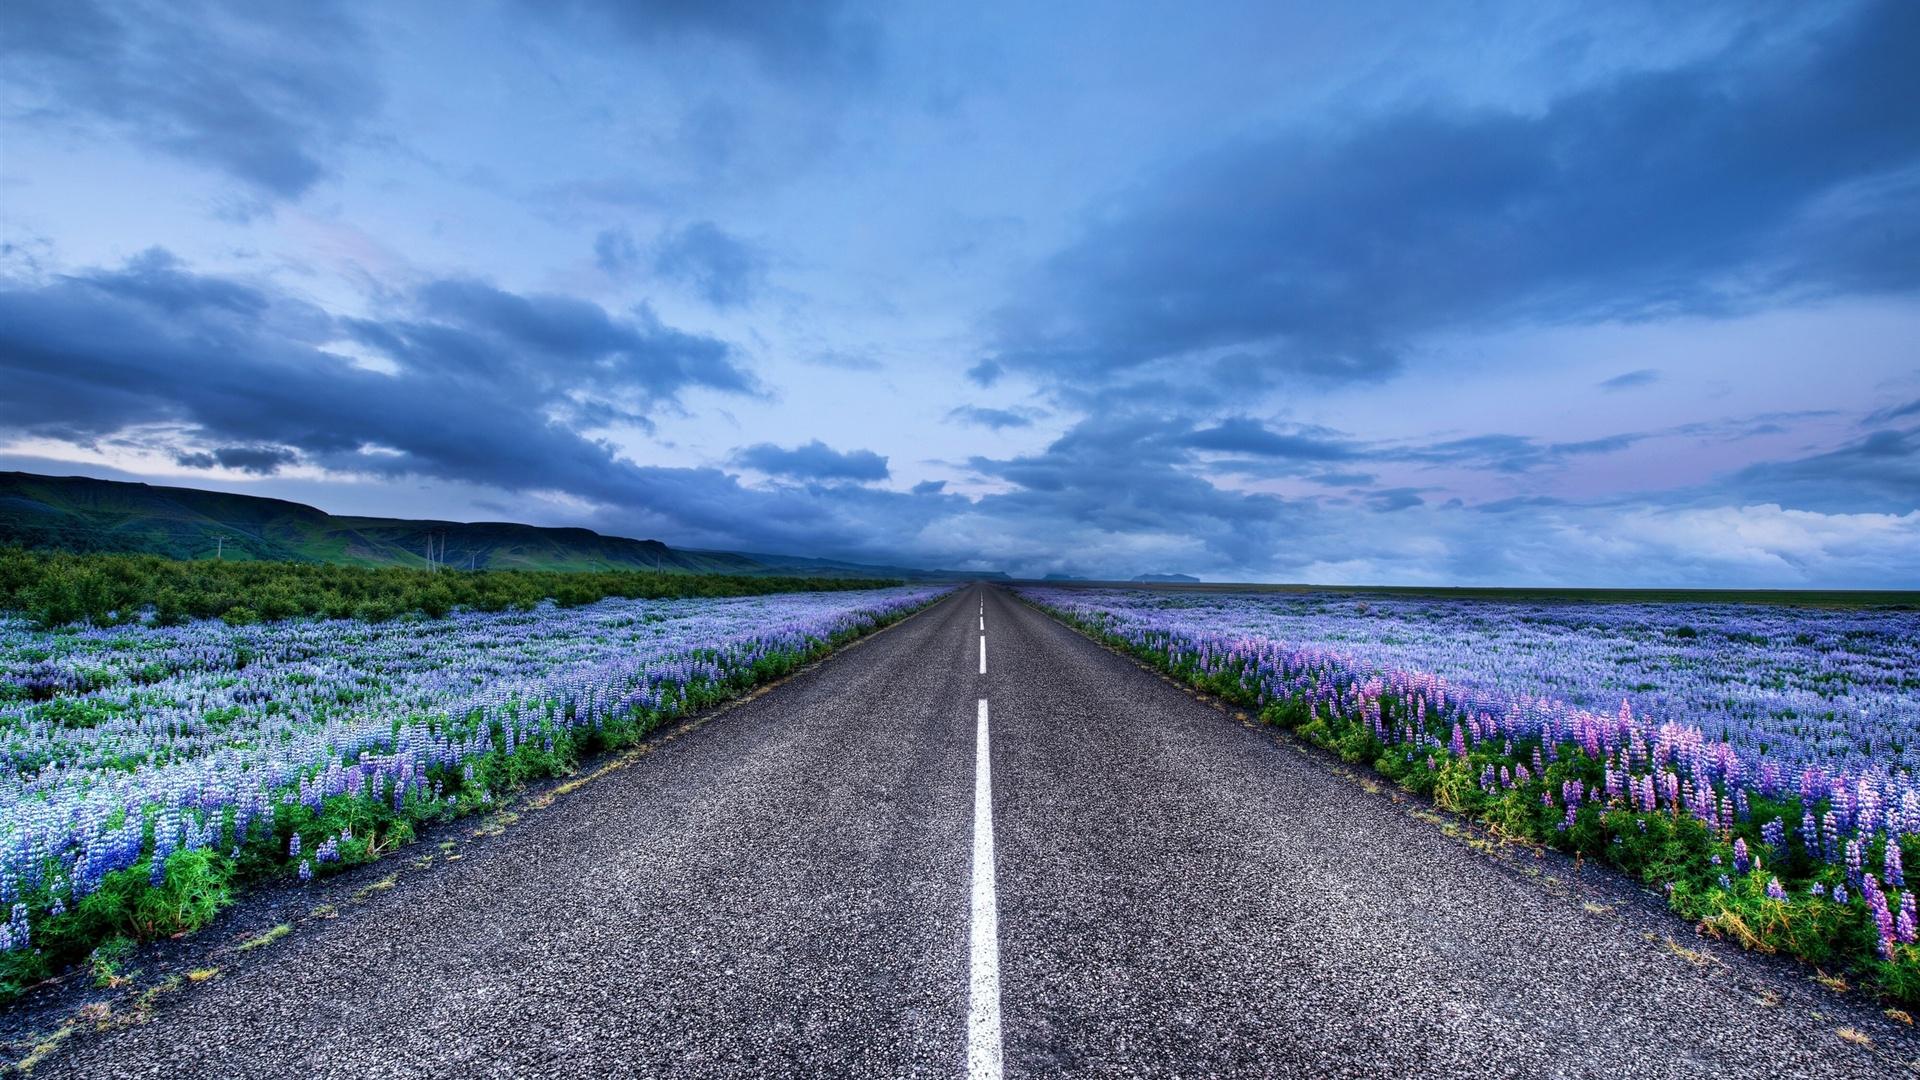 Iceland S Ring Road Wallpapers: Full HD Desktop Wallpapers 1080p